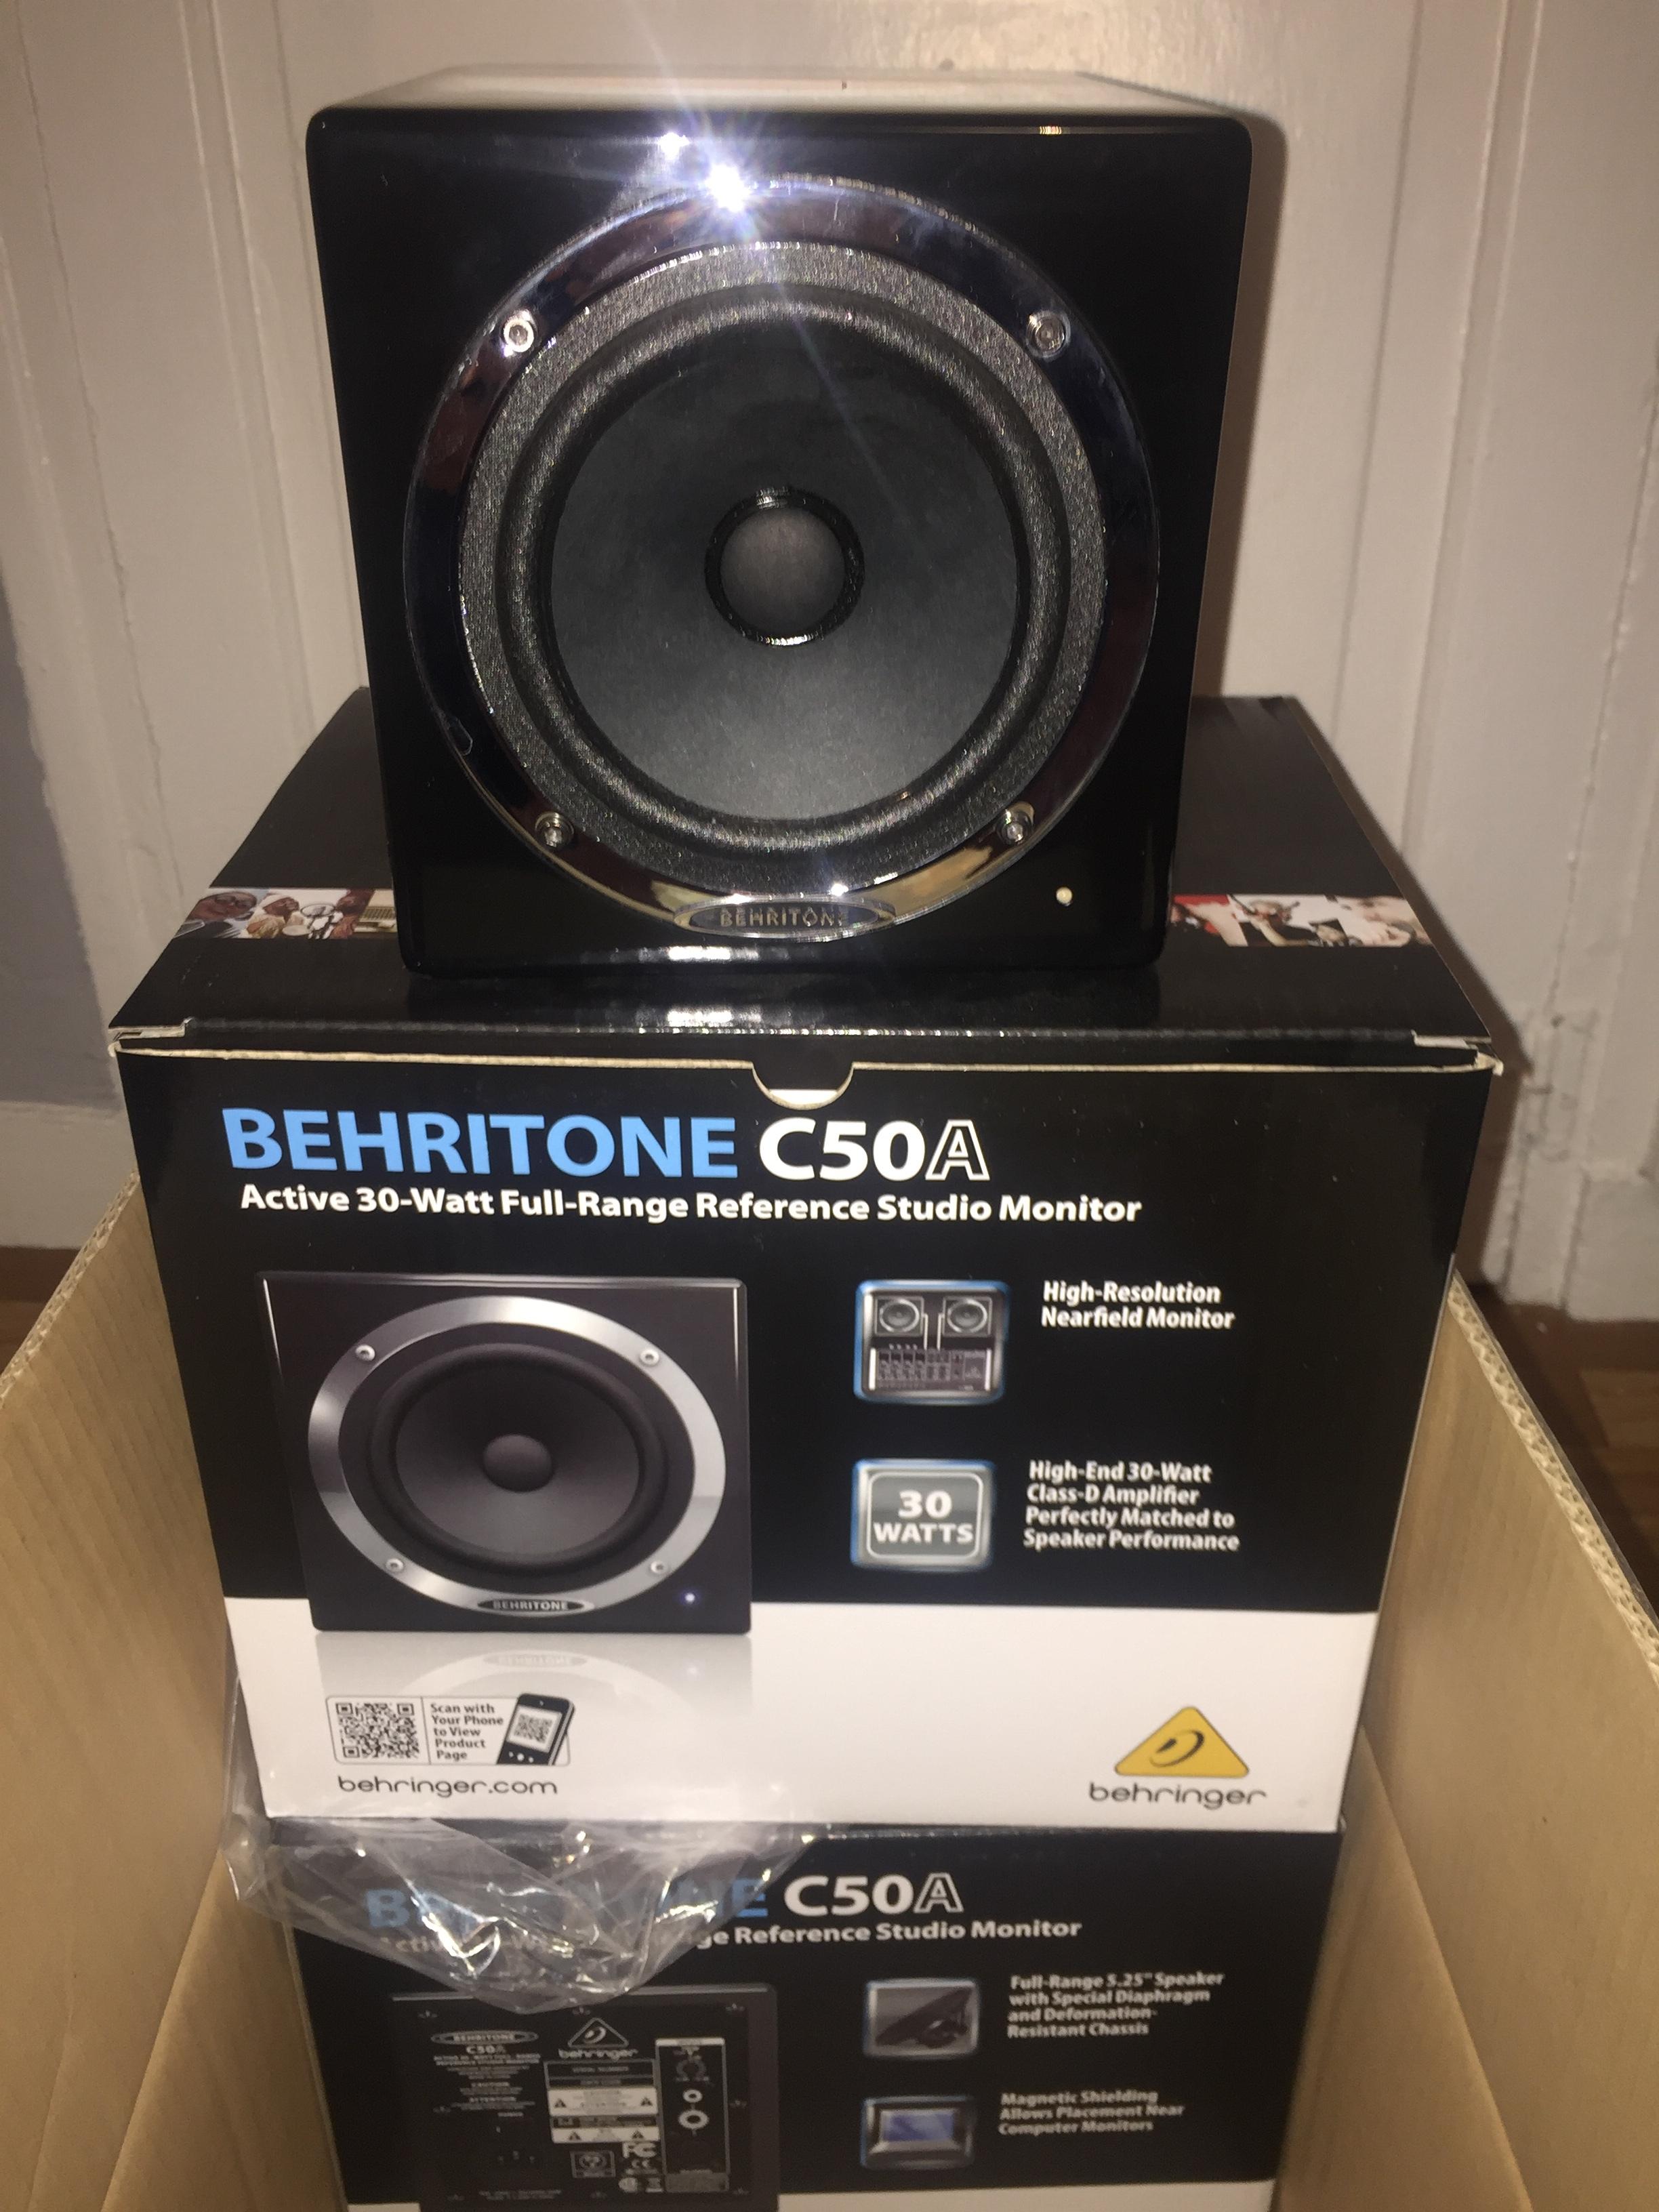 BEHRINGER BEHRITONE C50A